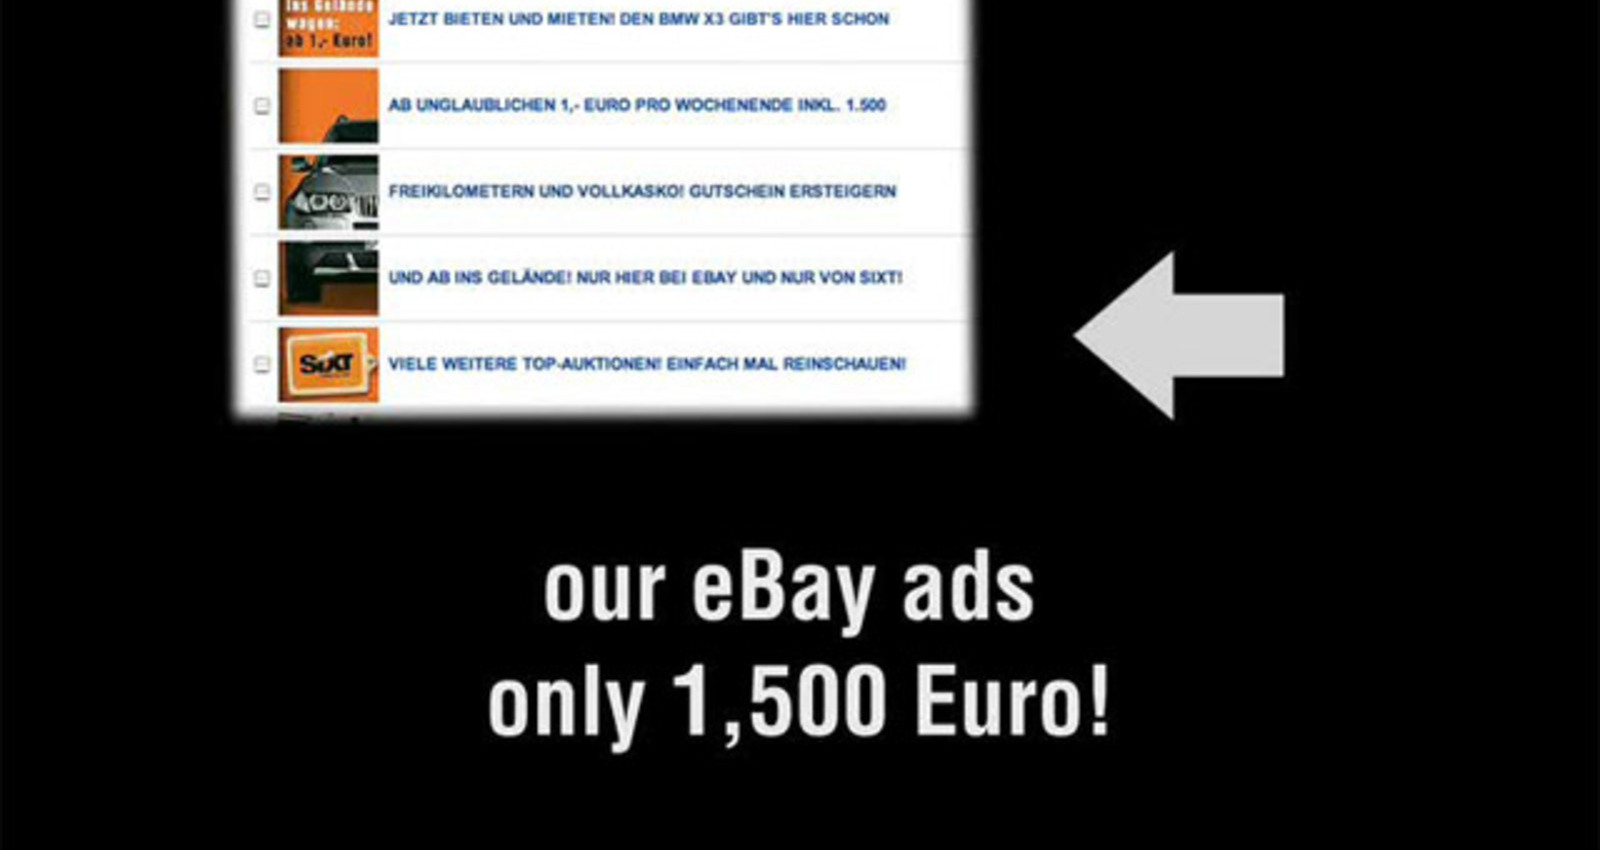 SIXT Ebay Ads